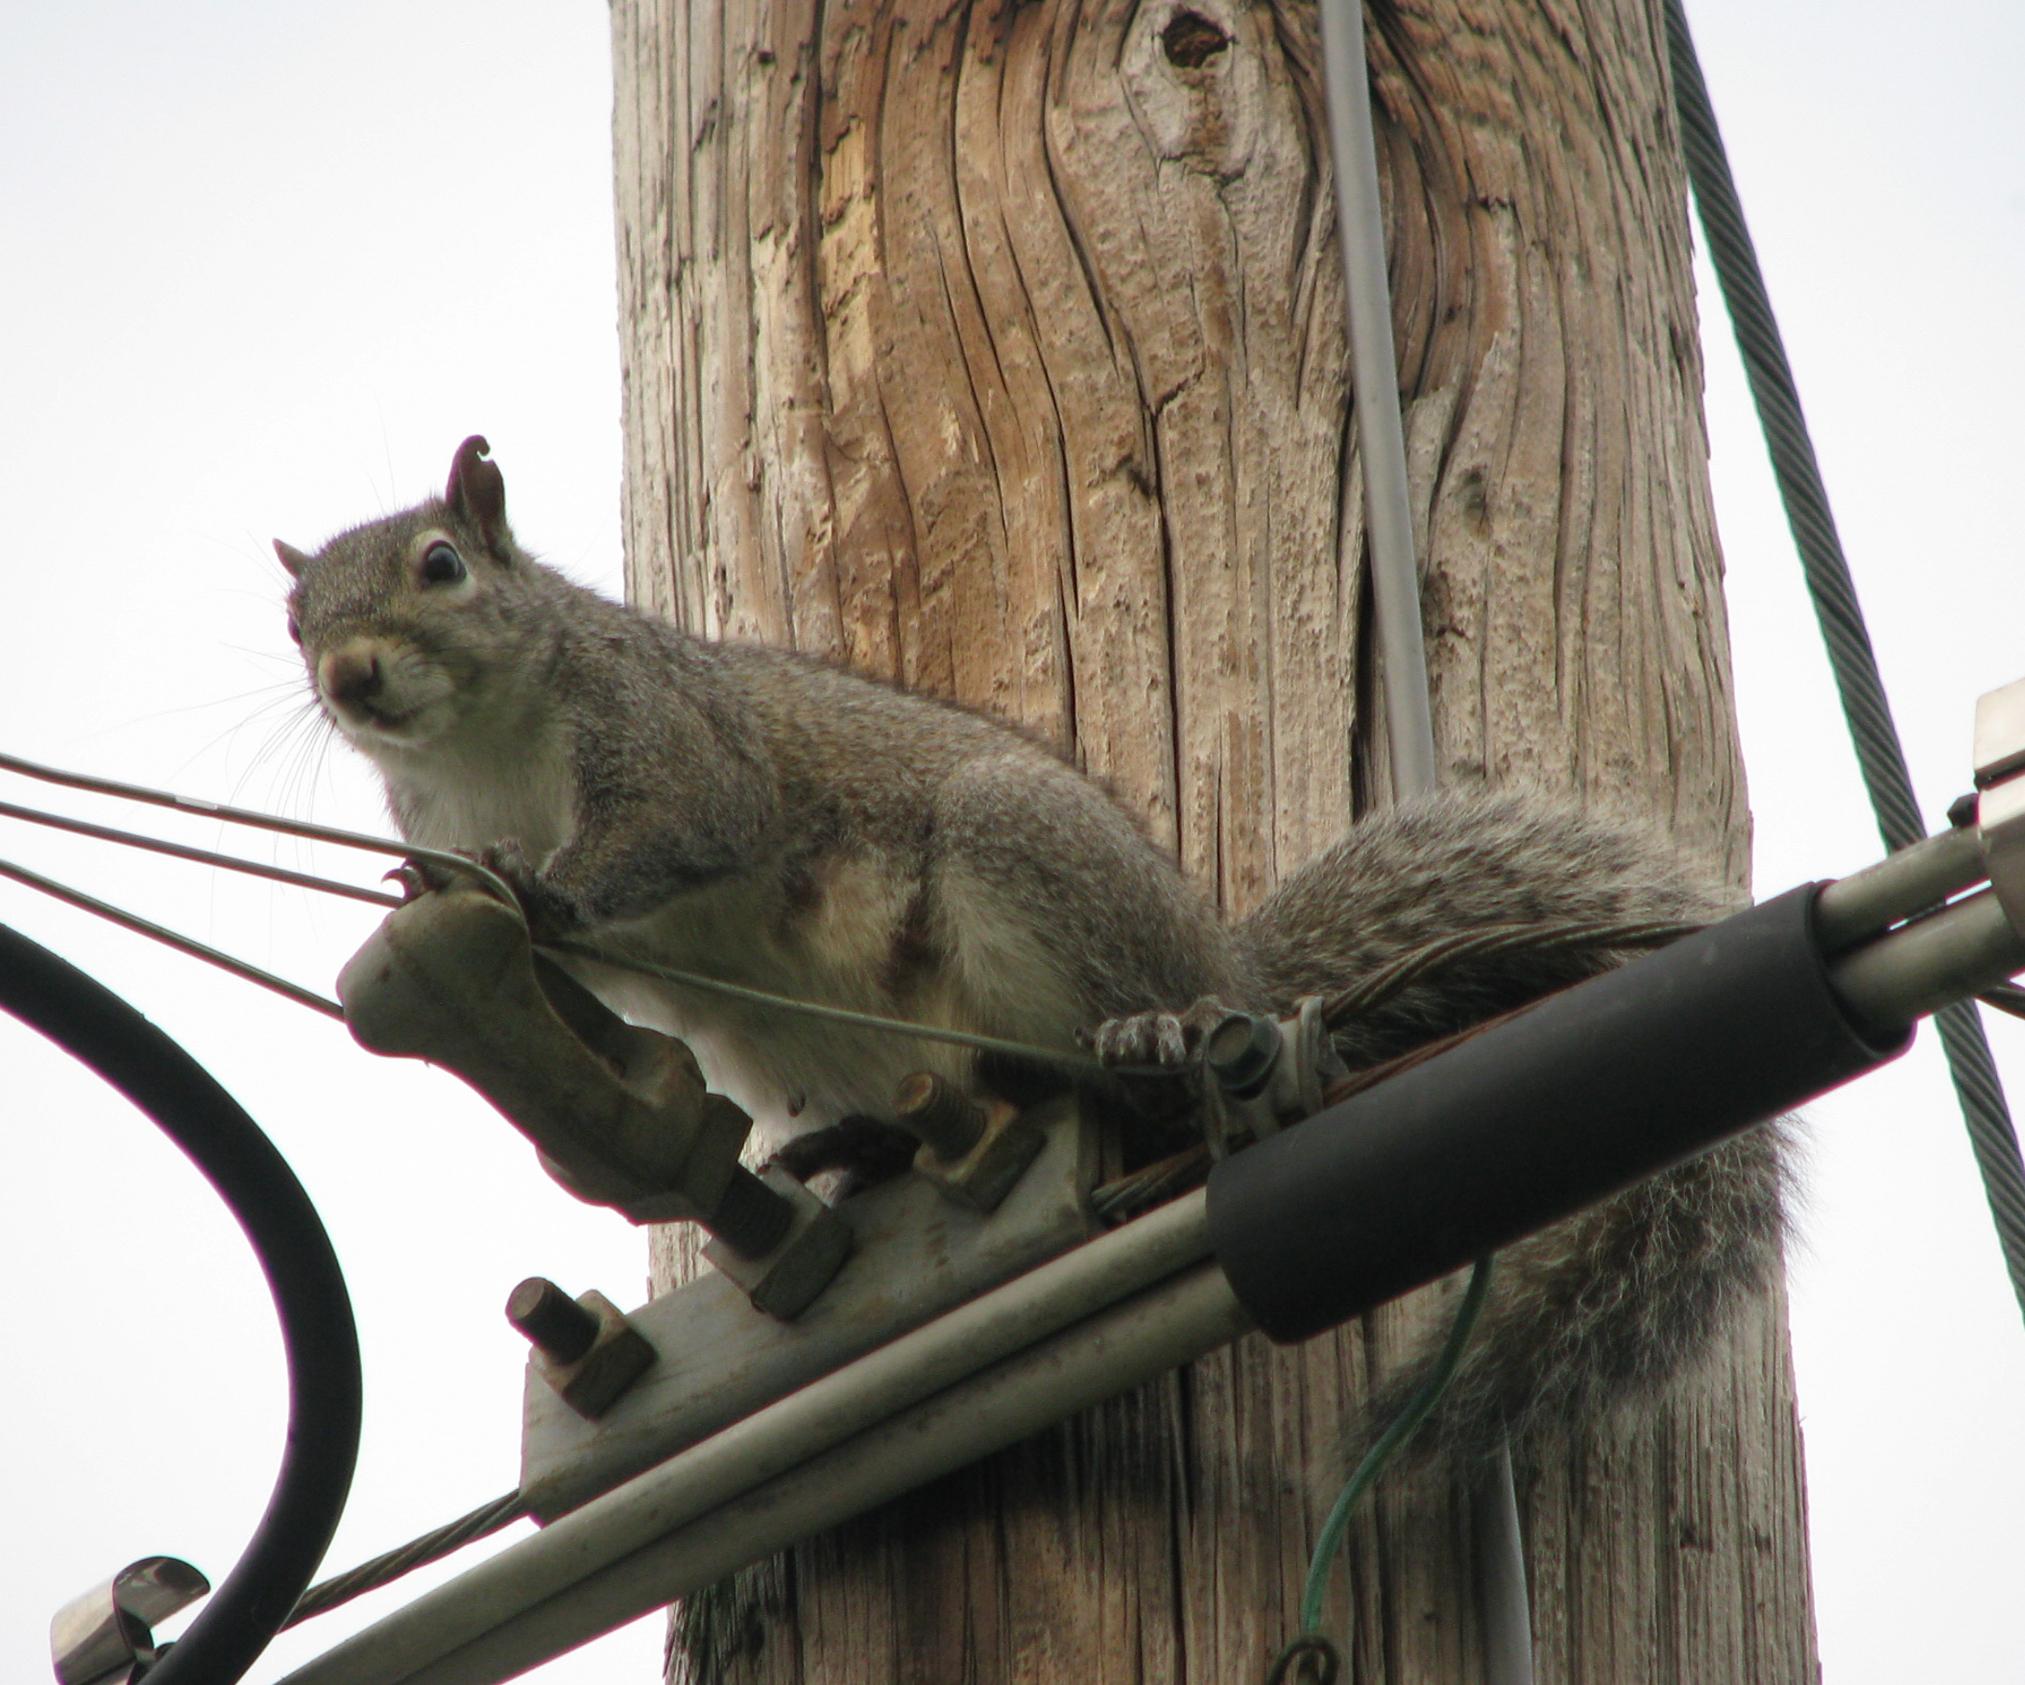 Squirrel Photos of 2017